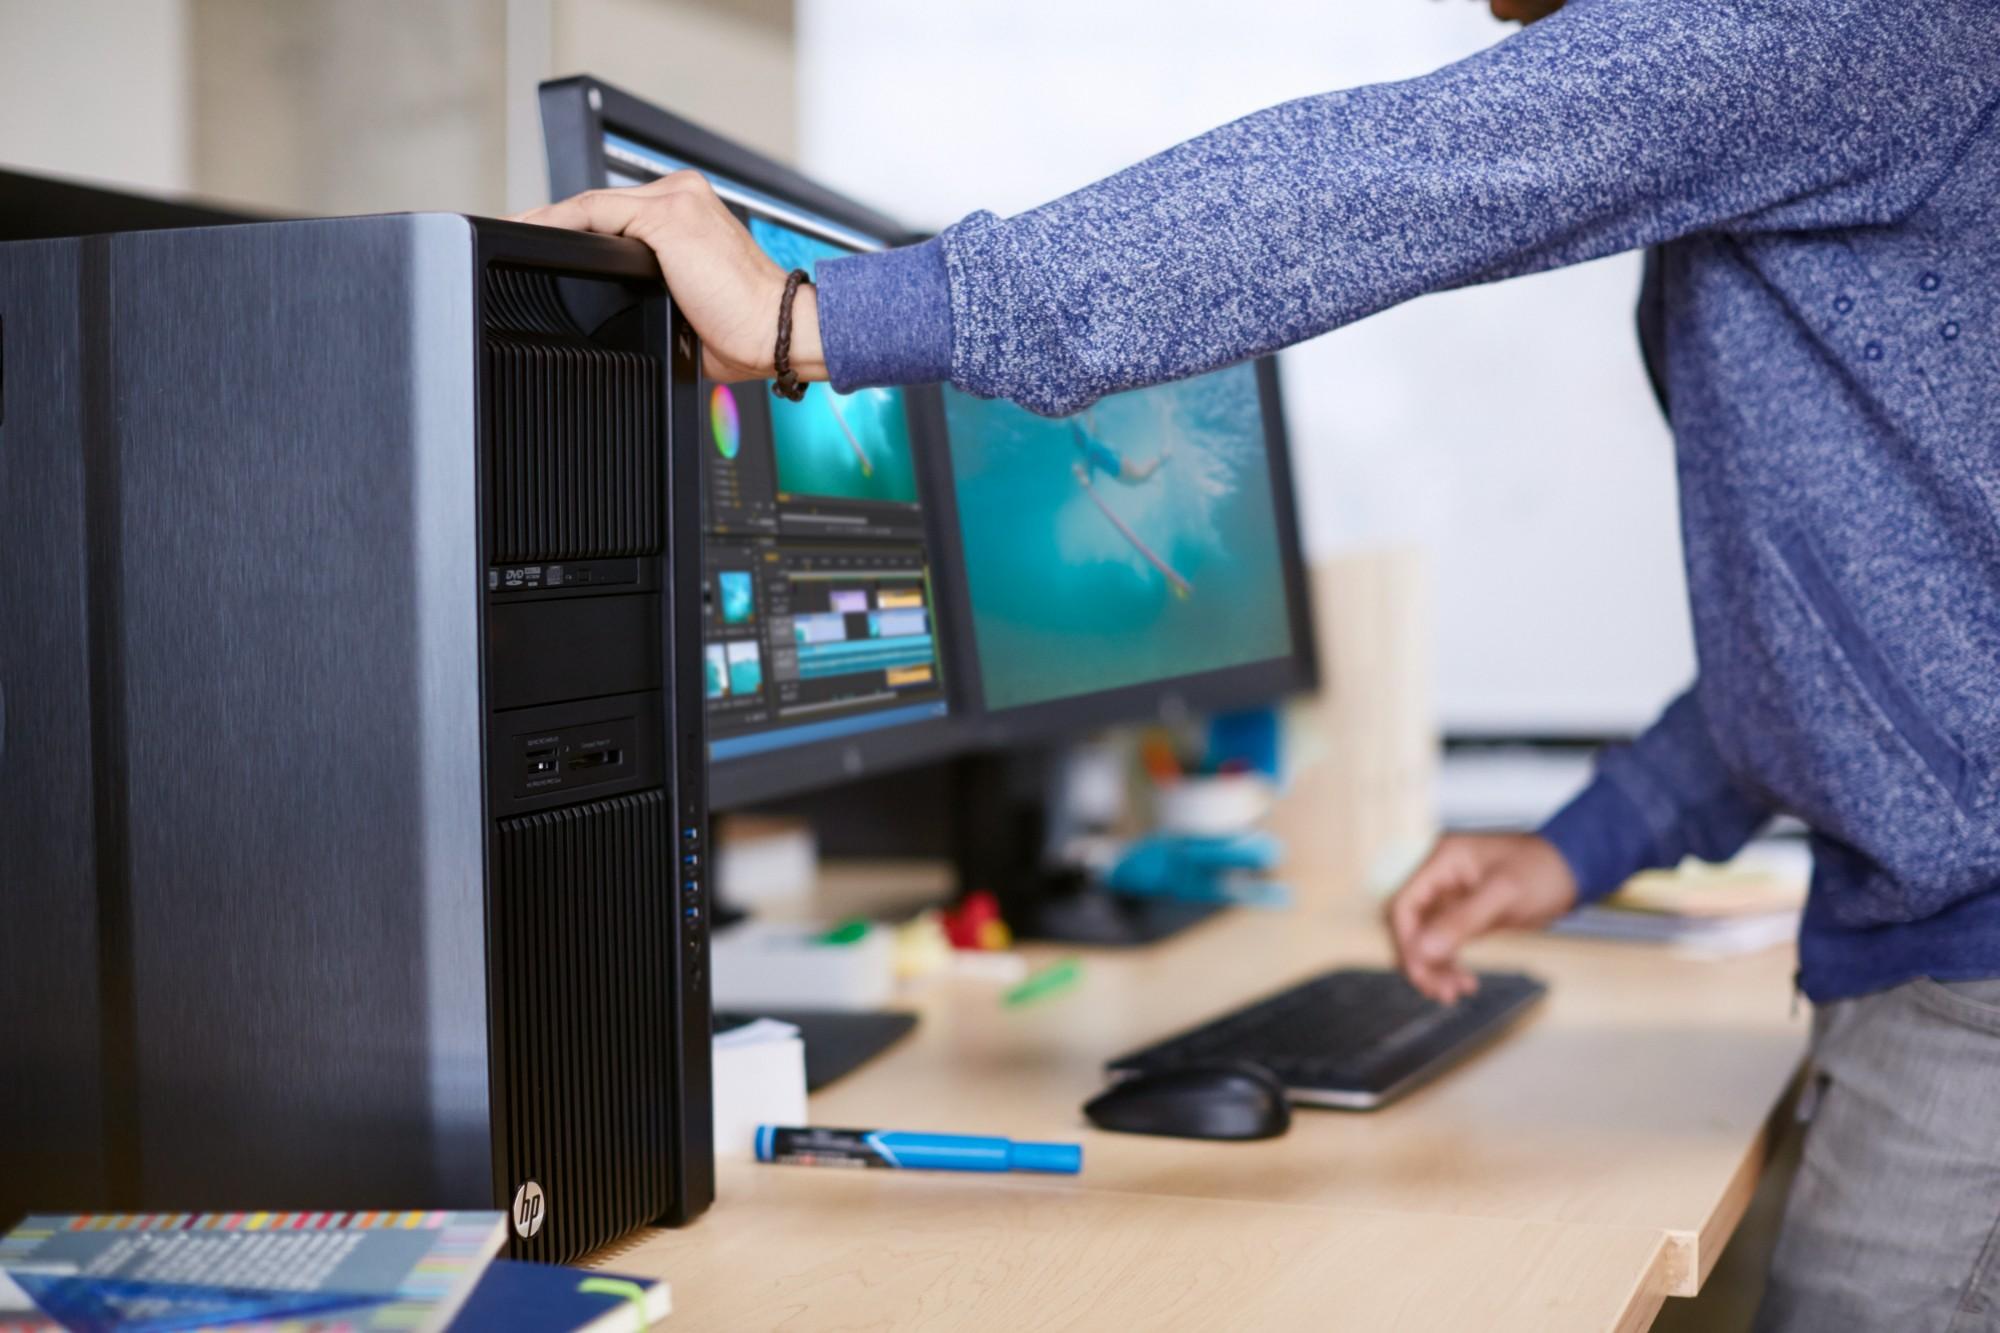 Hp Z440 Workstation Intel® Xeon® E5-2637 v4 3 5 8gb RAM 1TB